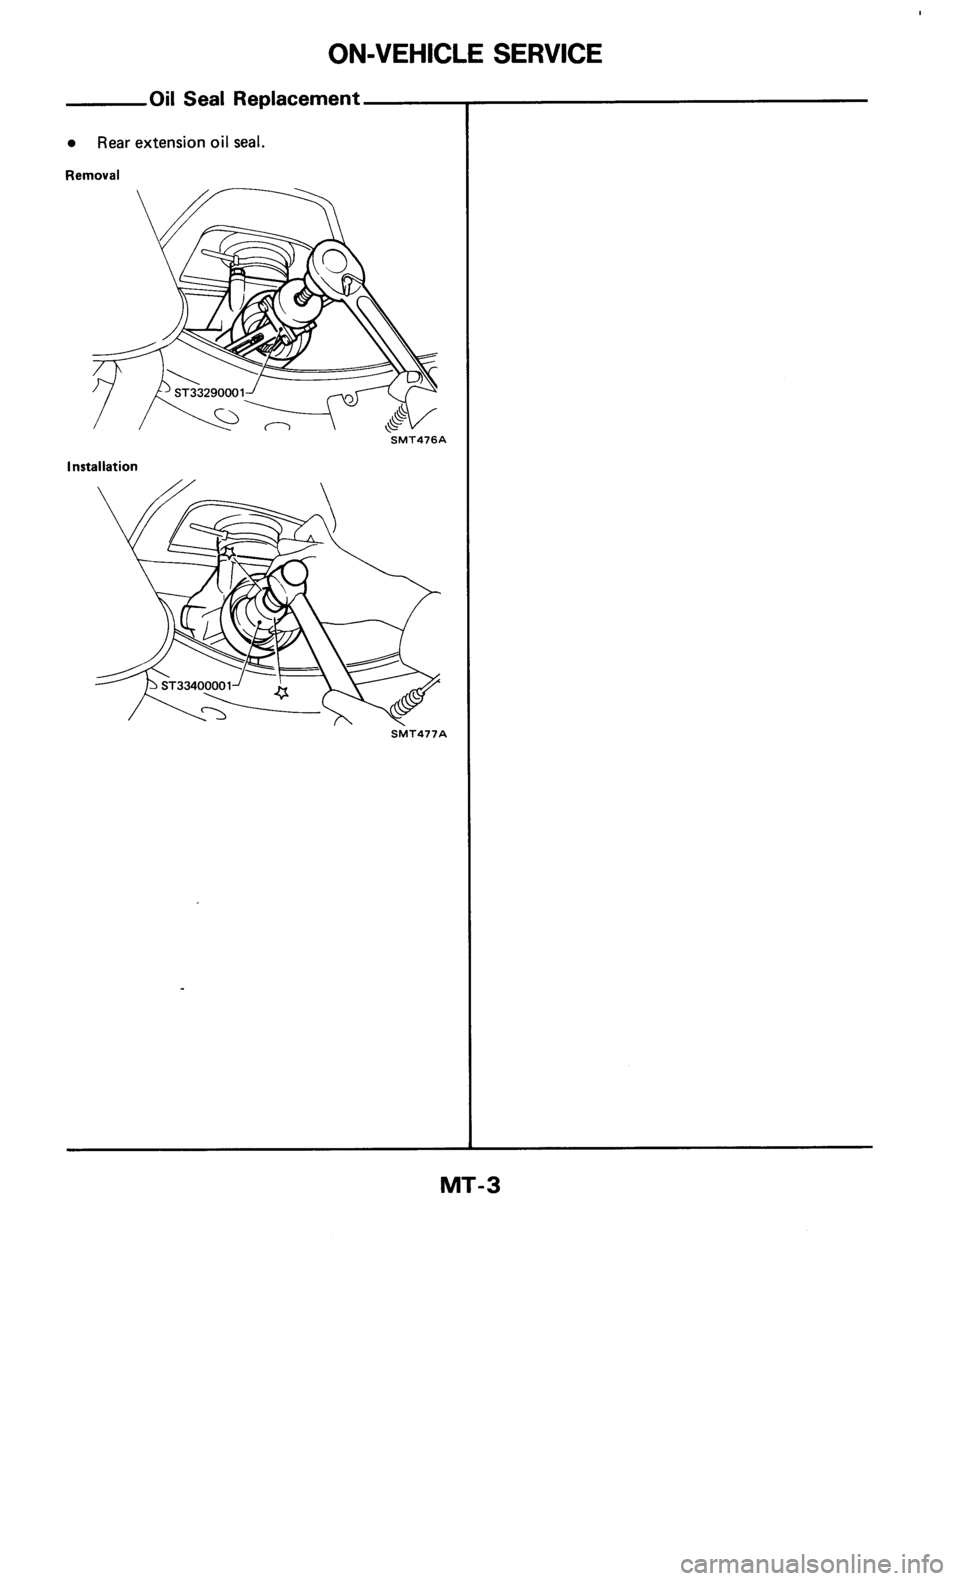 300zx Transmission Diagram Wiring Schematic Z32 Nissan 1986 Z31 Manual Workshop Master Cylinder